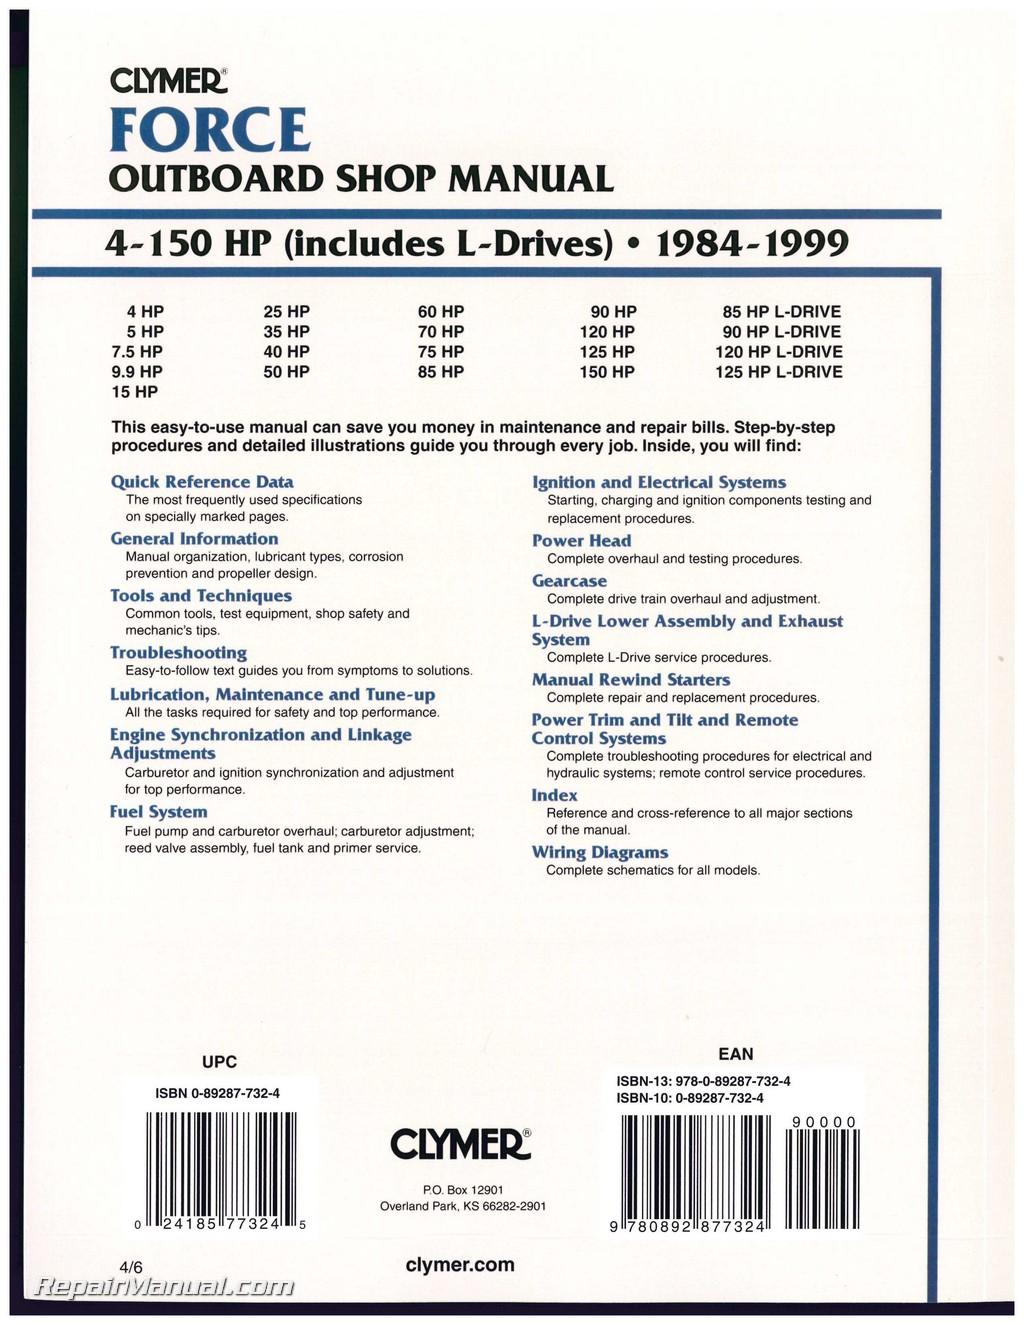 boat motor repair manual online motorssite org rh motorssite org 125 Force Outboard Hard Starting Force Outboard Motor Parts Diagram